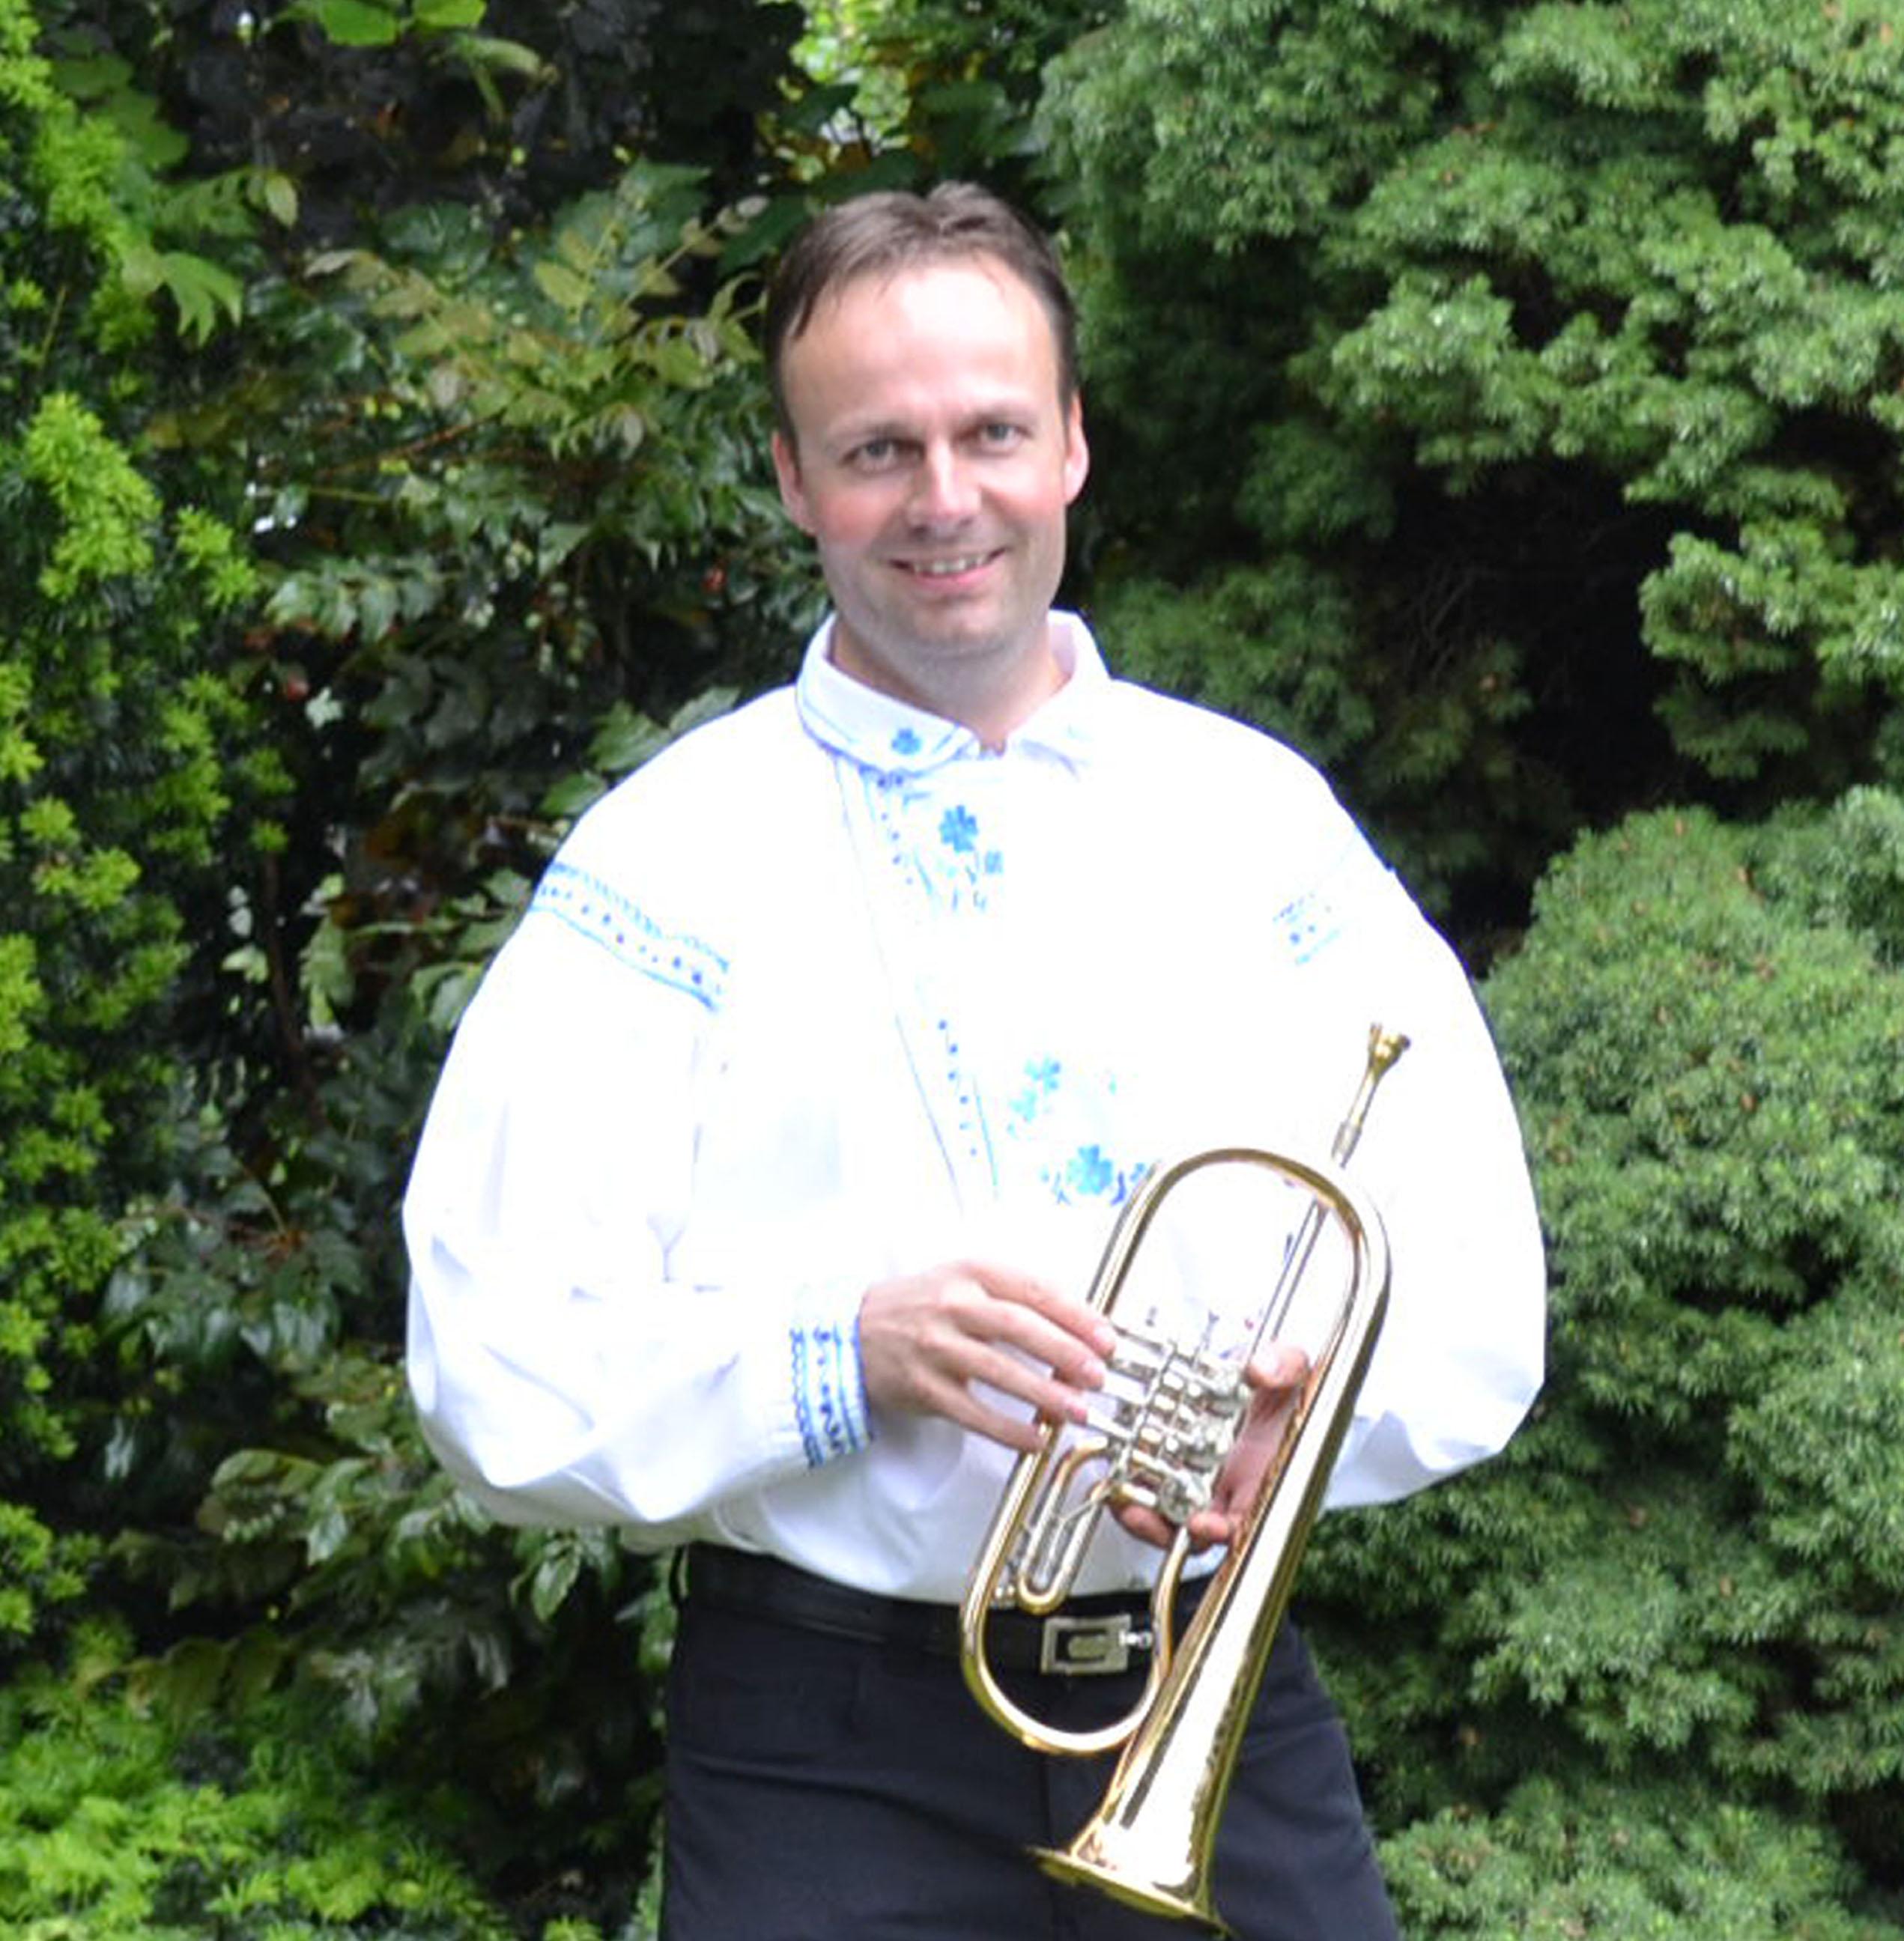 Alexander Beterams